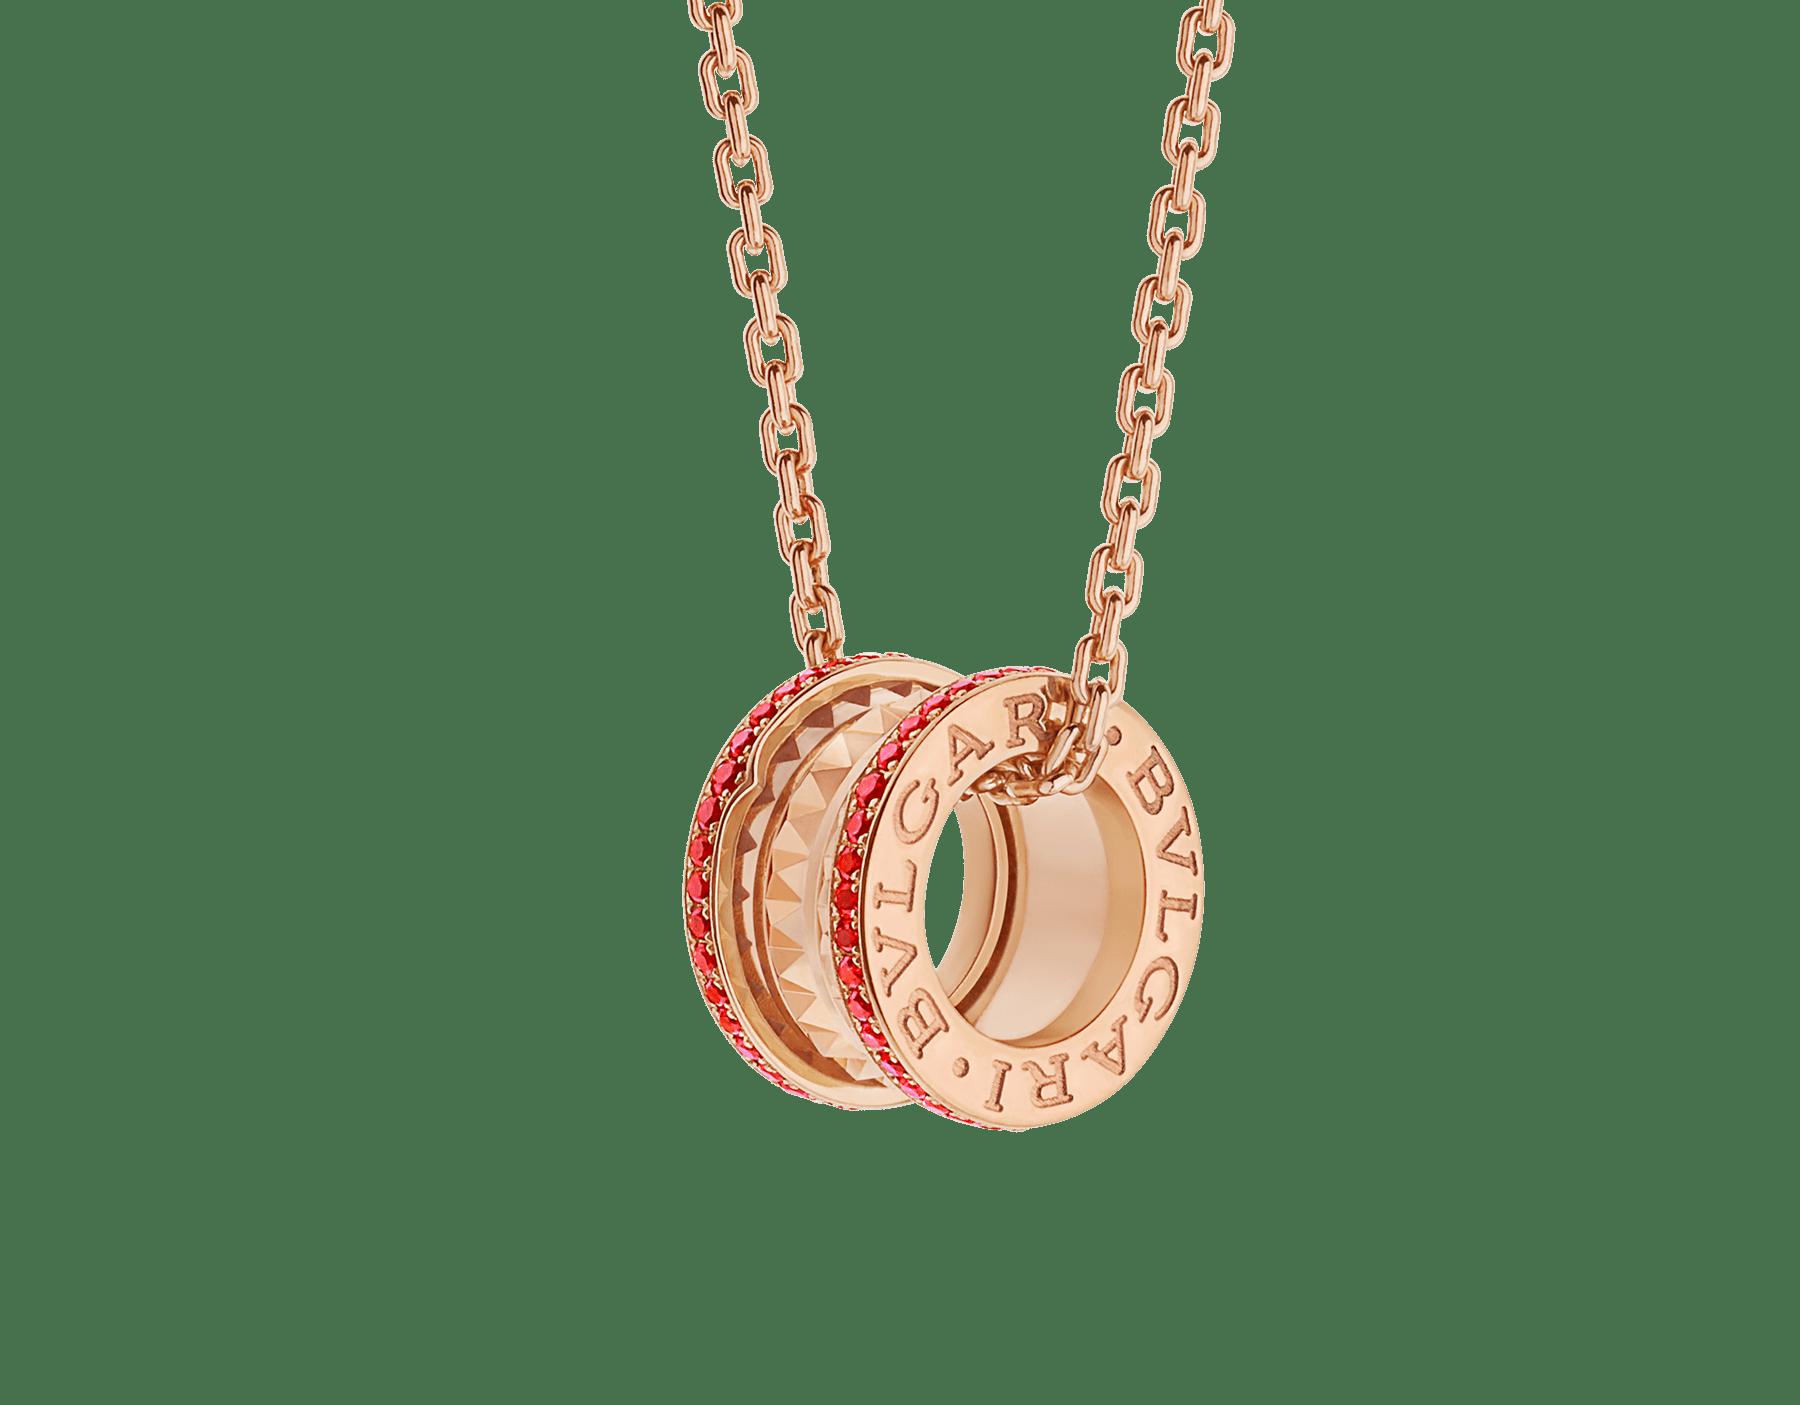 BVLGARI BVLGARI 18K 玫瑰金翻轉式戒指,鑲飾翡翠和密鑲鑽石。 358306 image 1